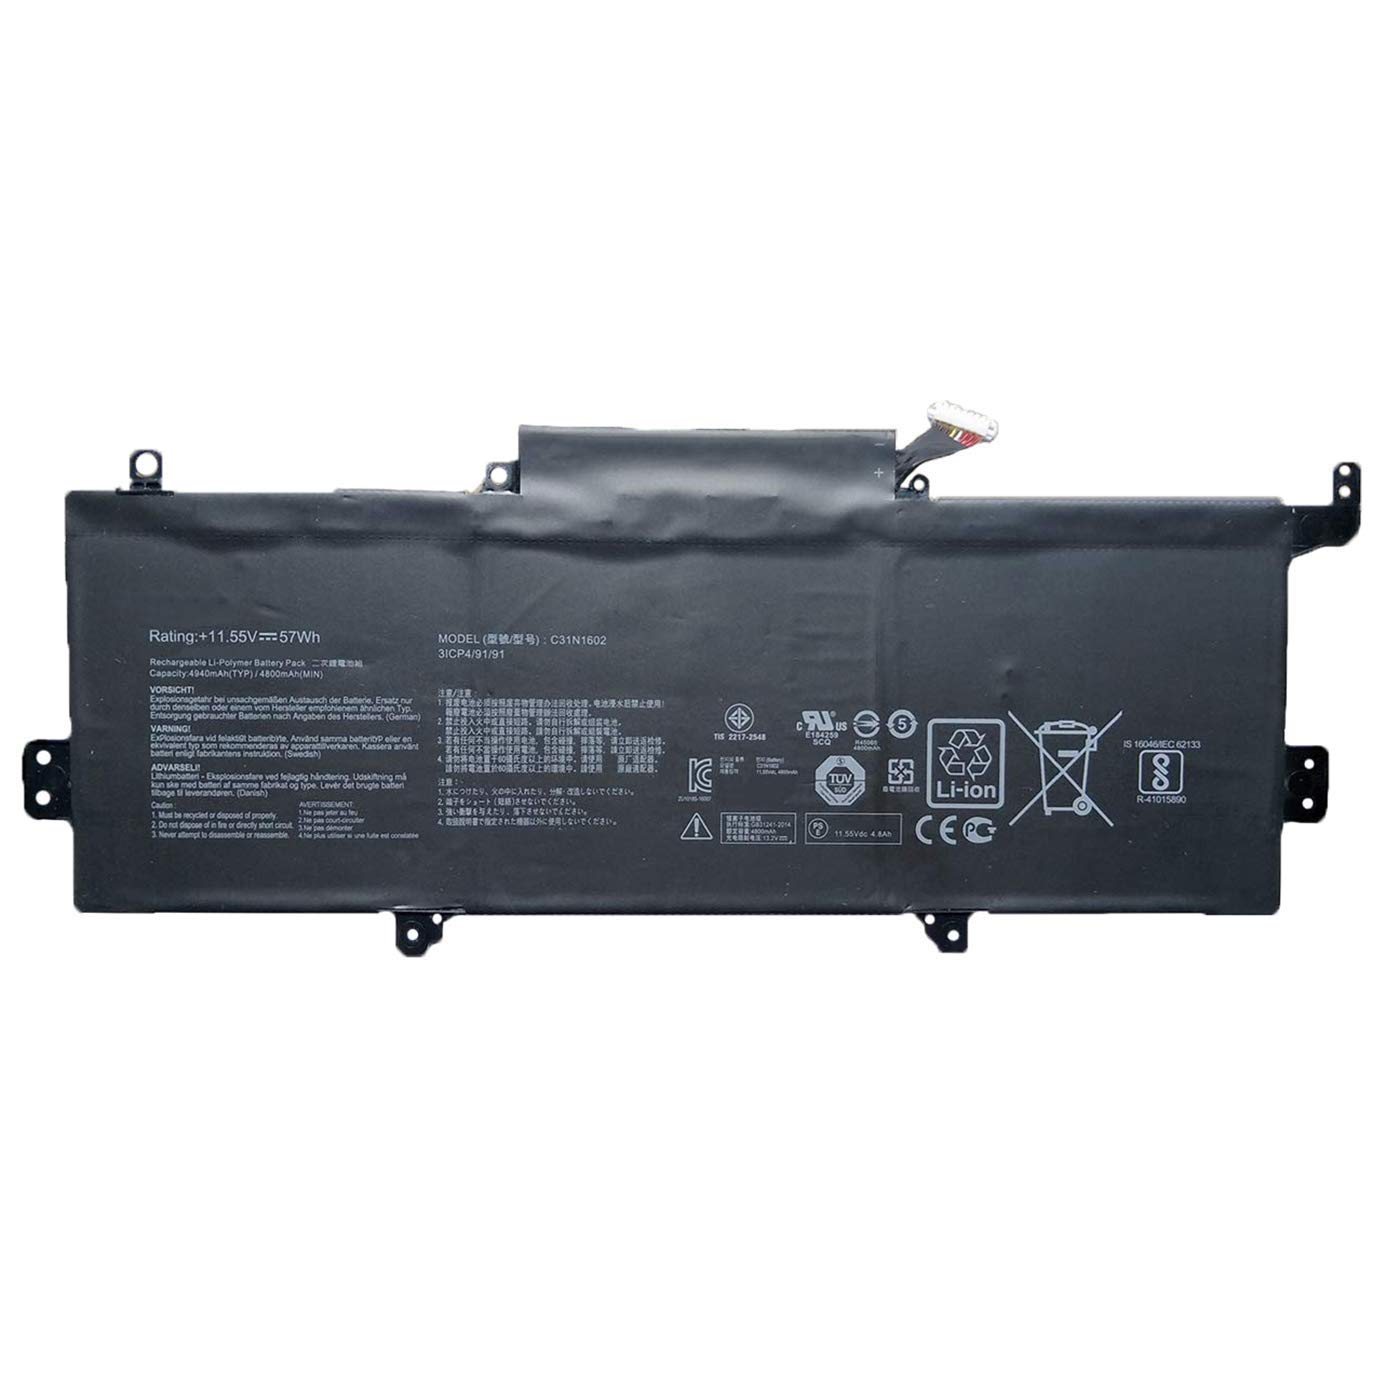 Bateria C31n1602 11.55v 57wh Para Asus Zenbook U3000u Ux330 Ux330u Ux330ua Ux330ua-1a Ux330ua-1b Ux330ua-1c Ux330ua-fb01